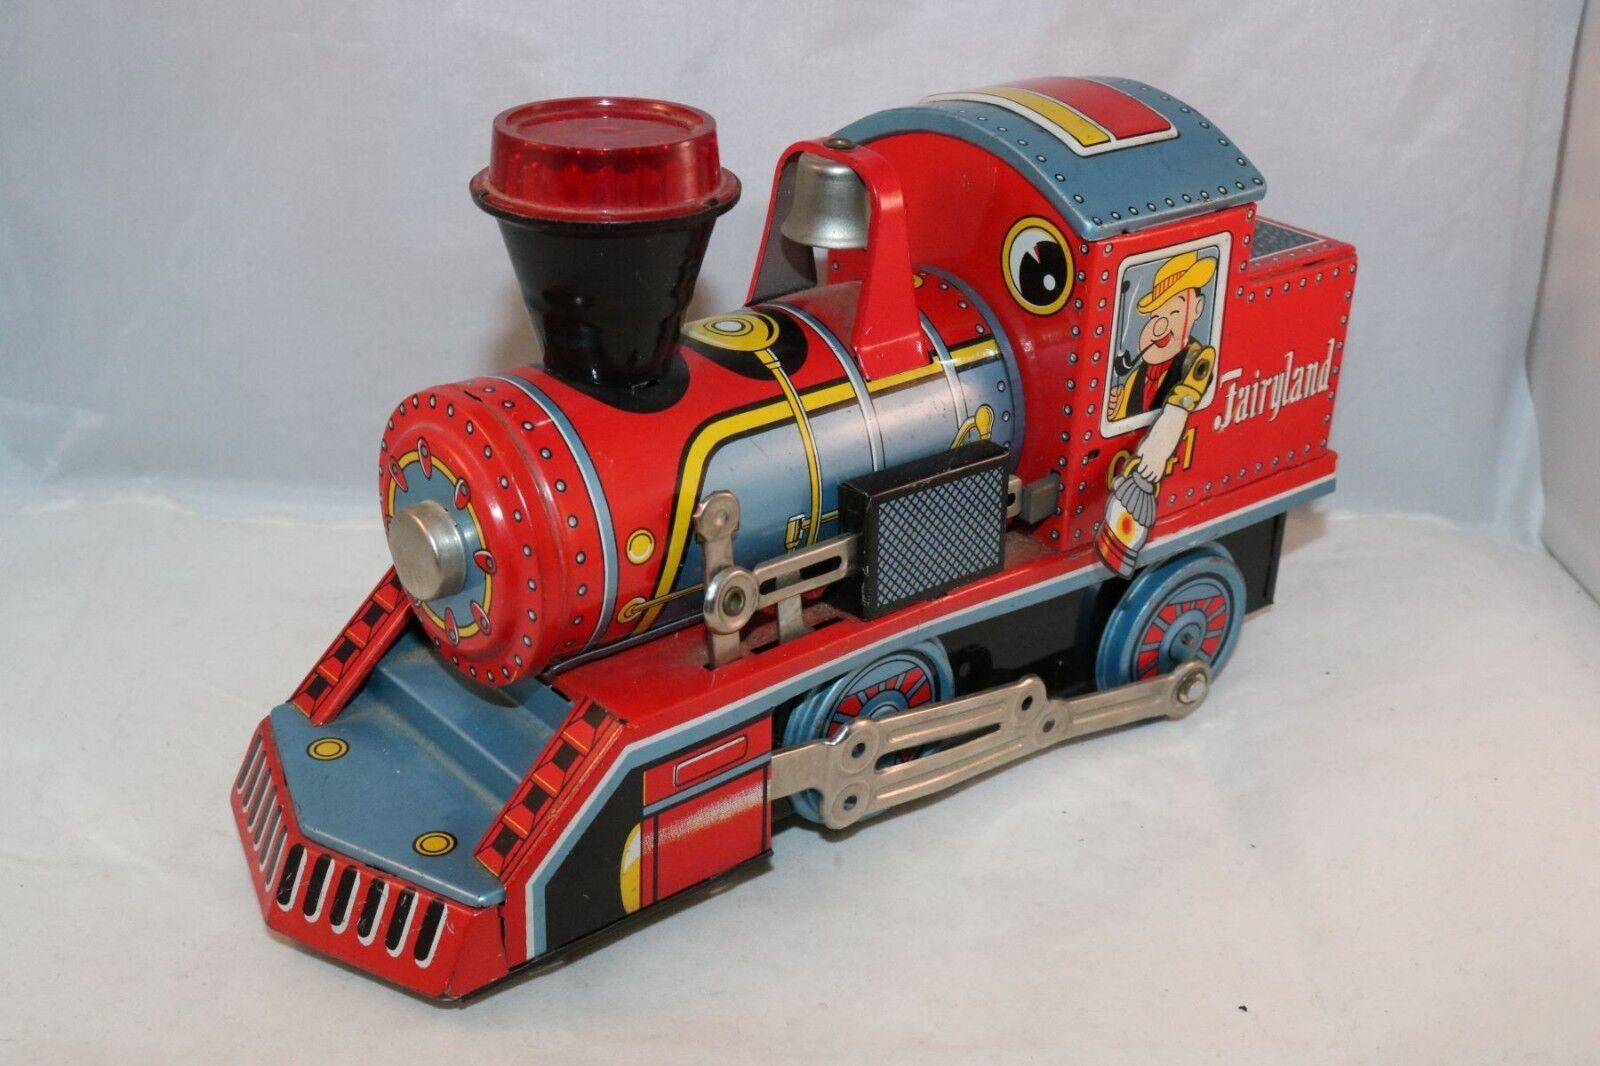 Daya Fairyland 0741 locomotive in near mint all original working condition